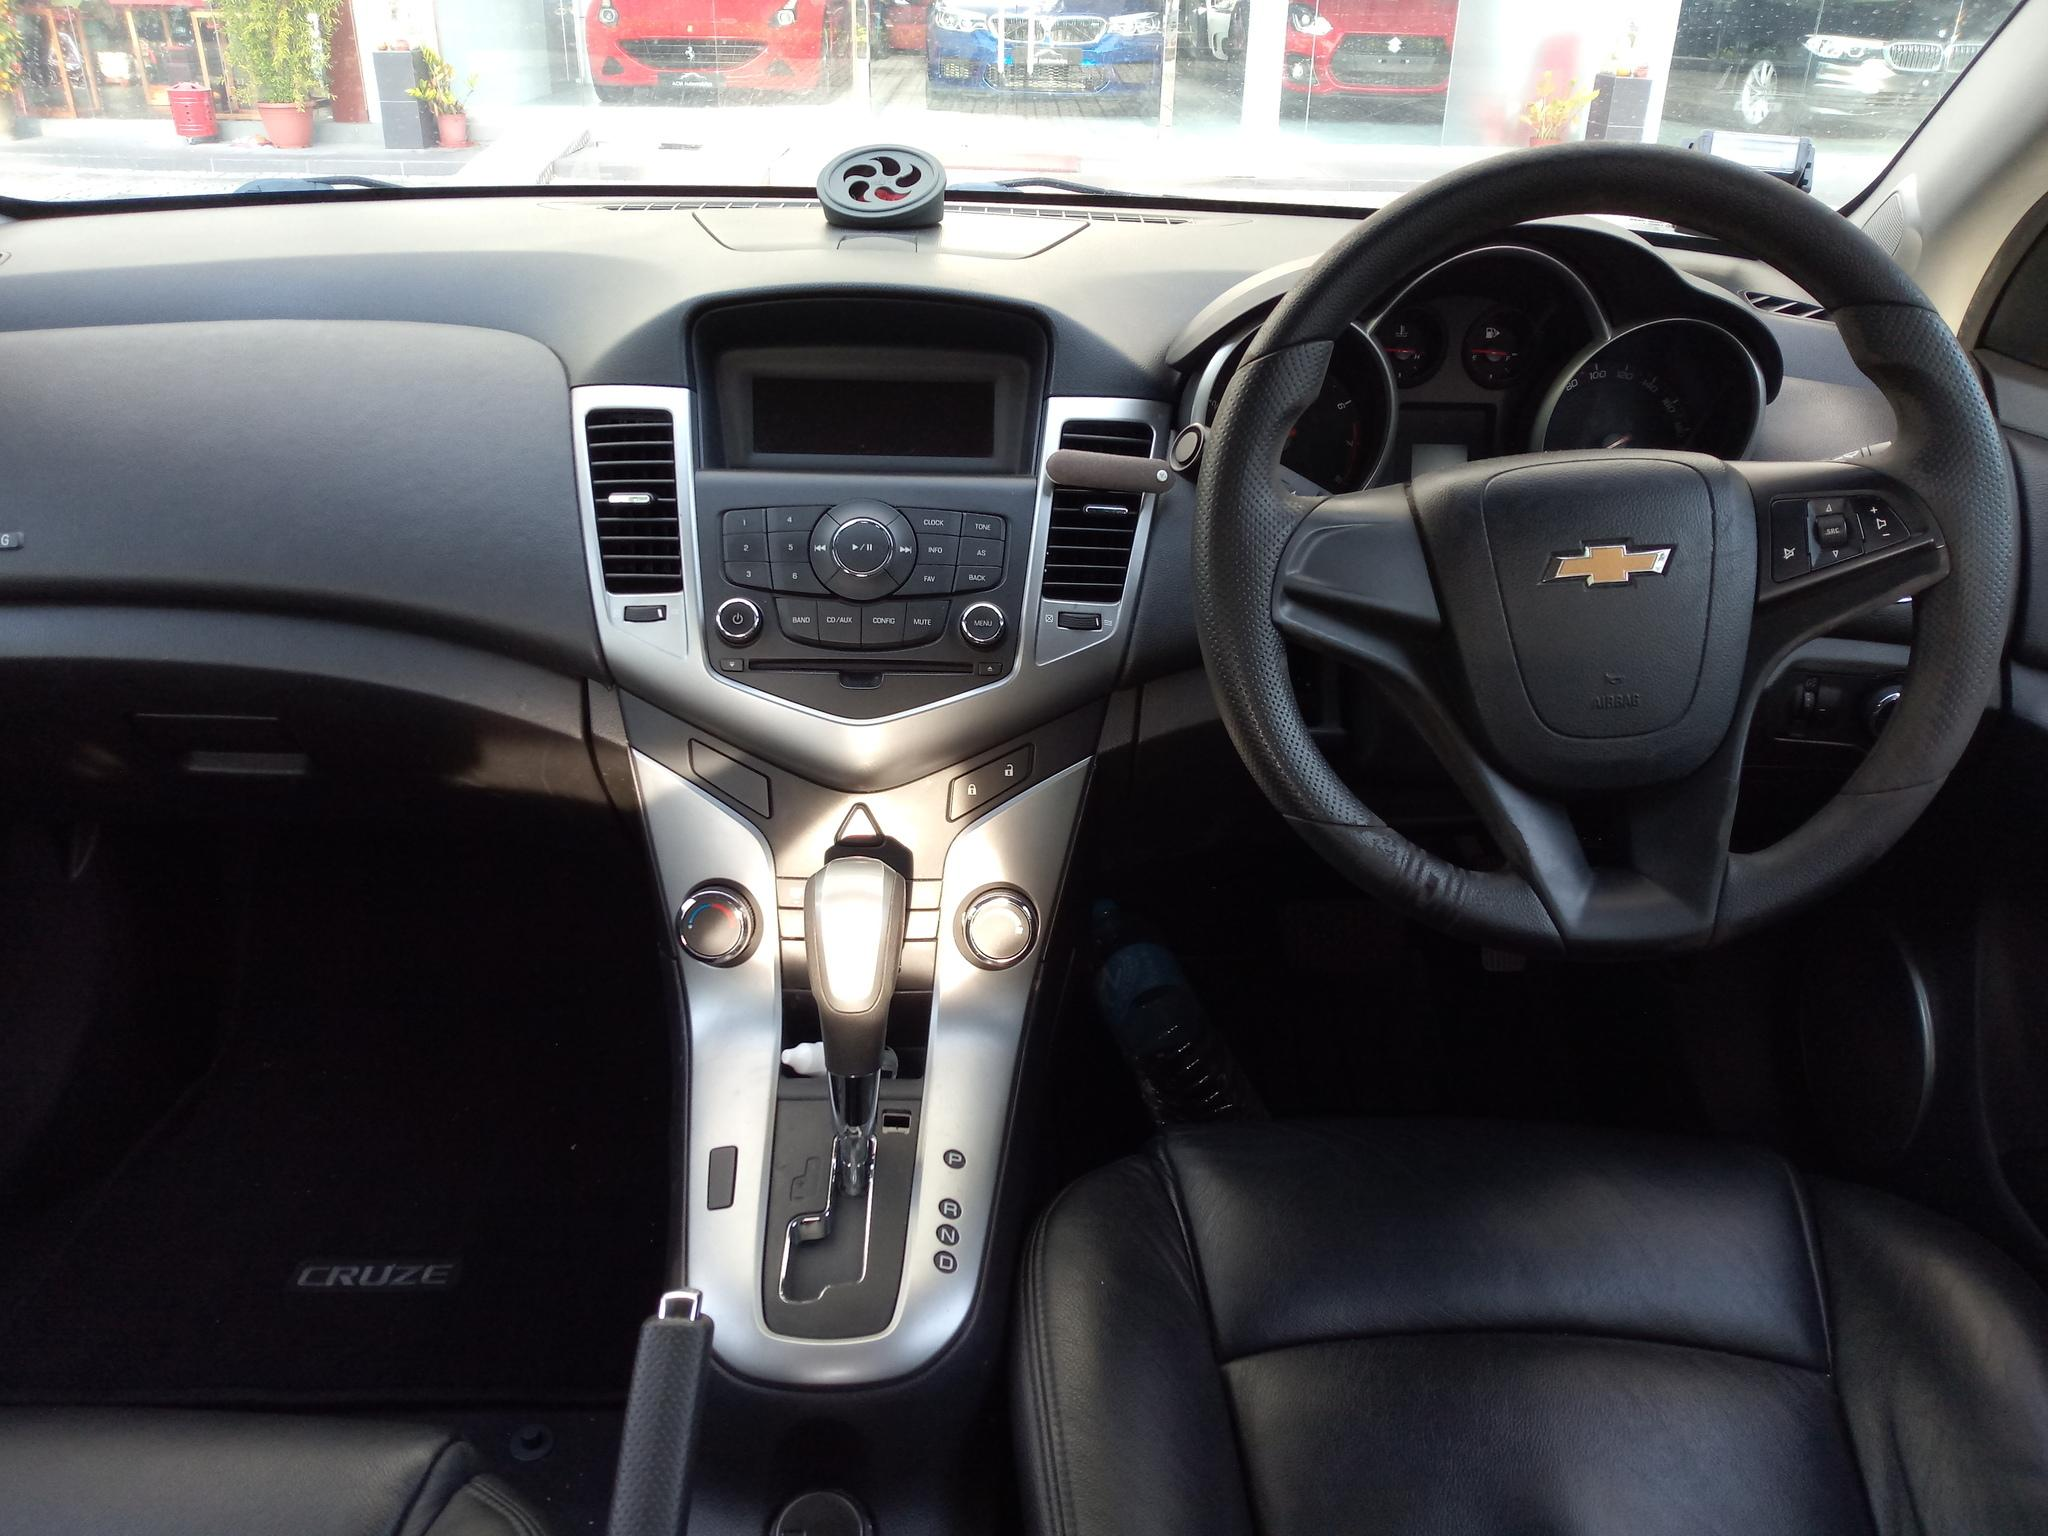 Chevrolet CRUZE 1.6A Short Term or Long Term Rental Car Service